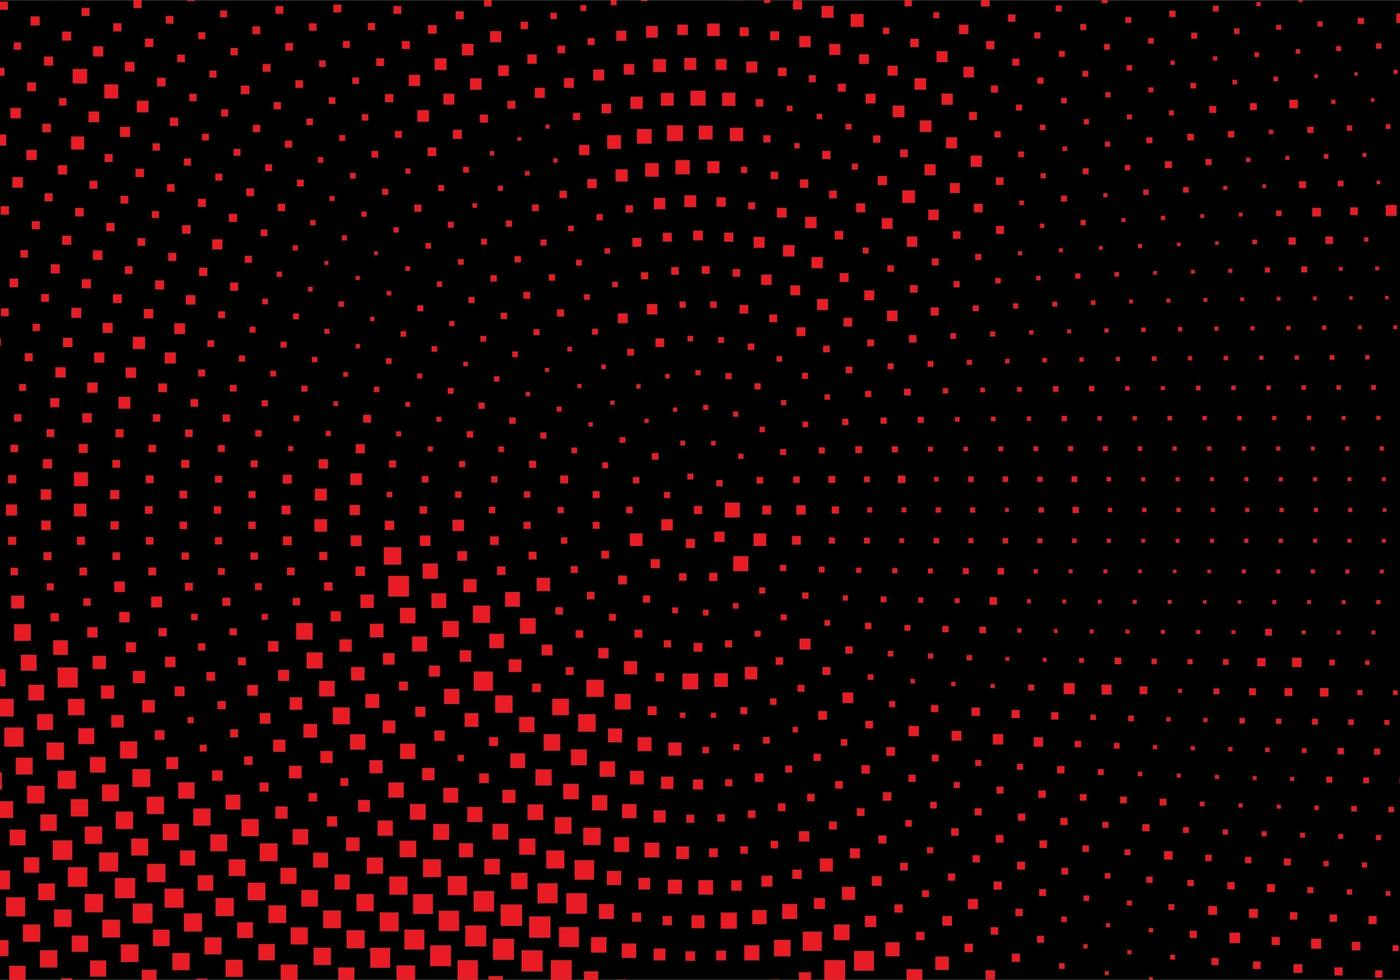 moderne rode en zwarte cirkel gestippelde achtergrond vector